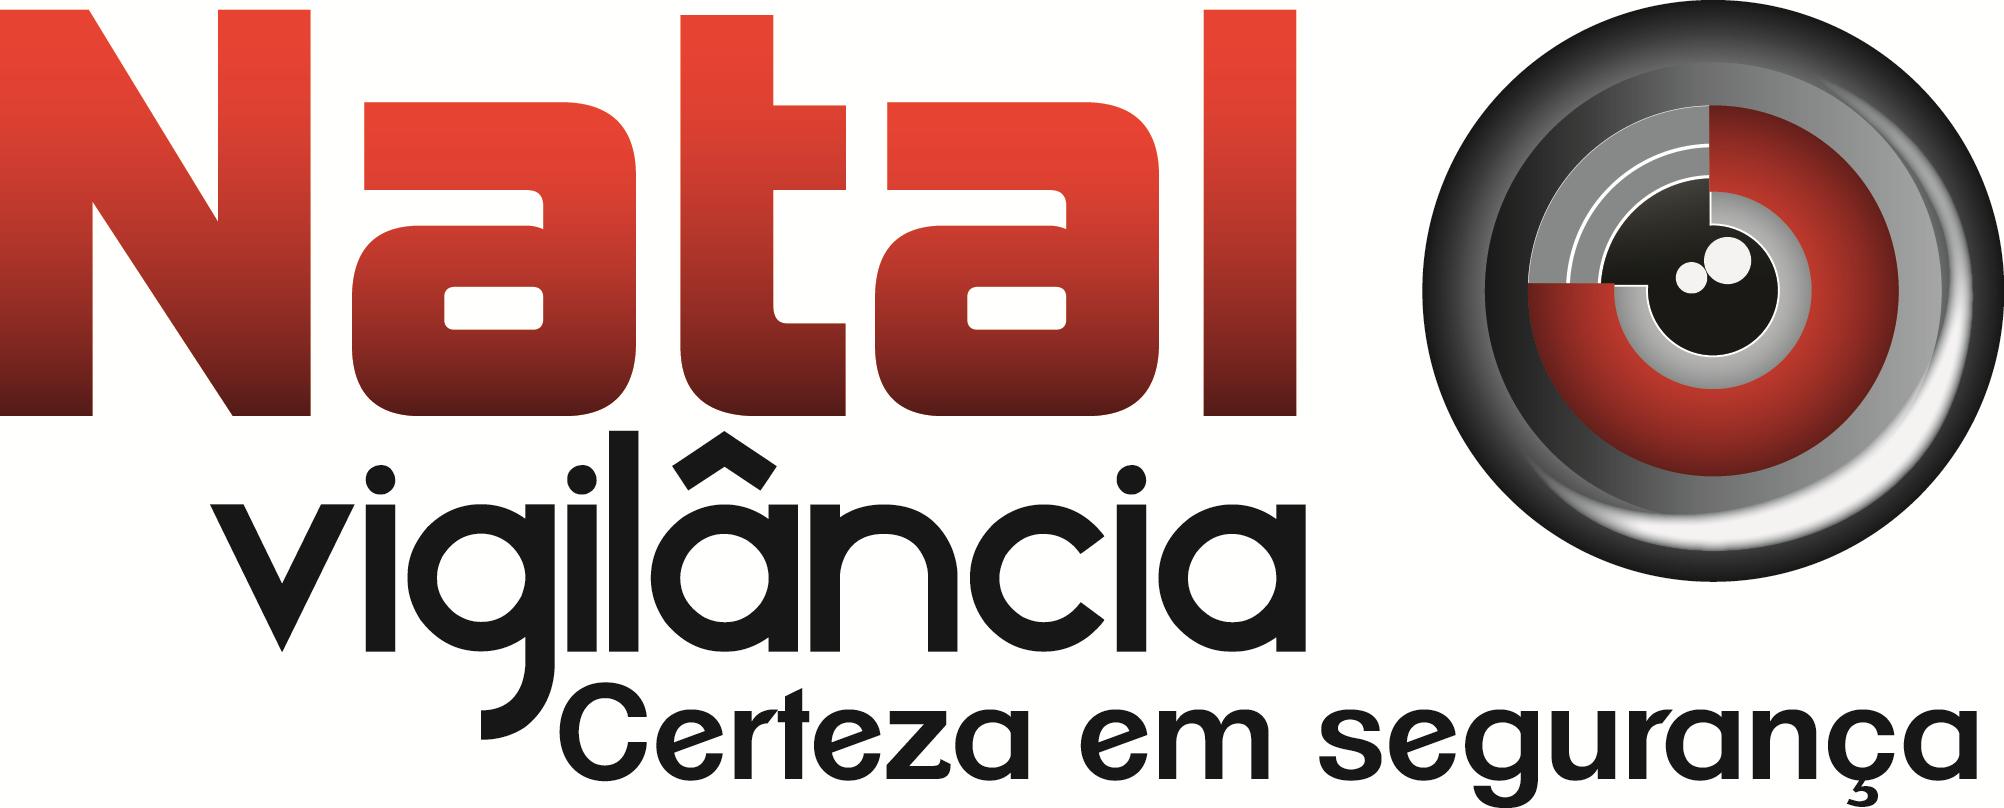 Logotipo Natal Vigilância finalizado_V8 (2)